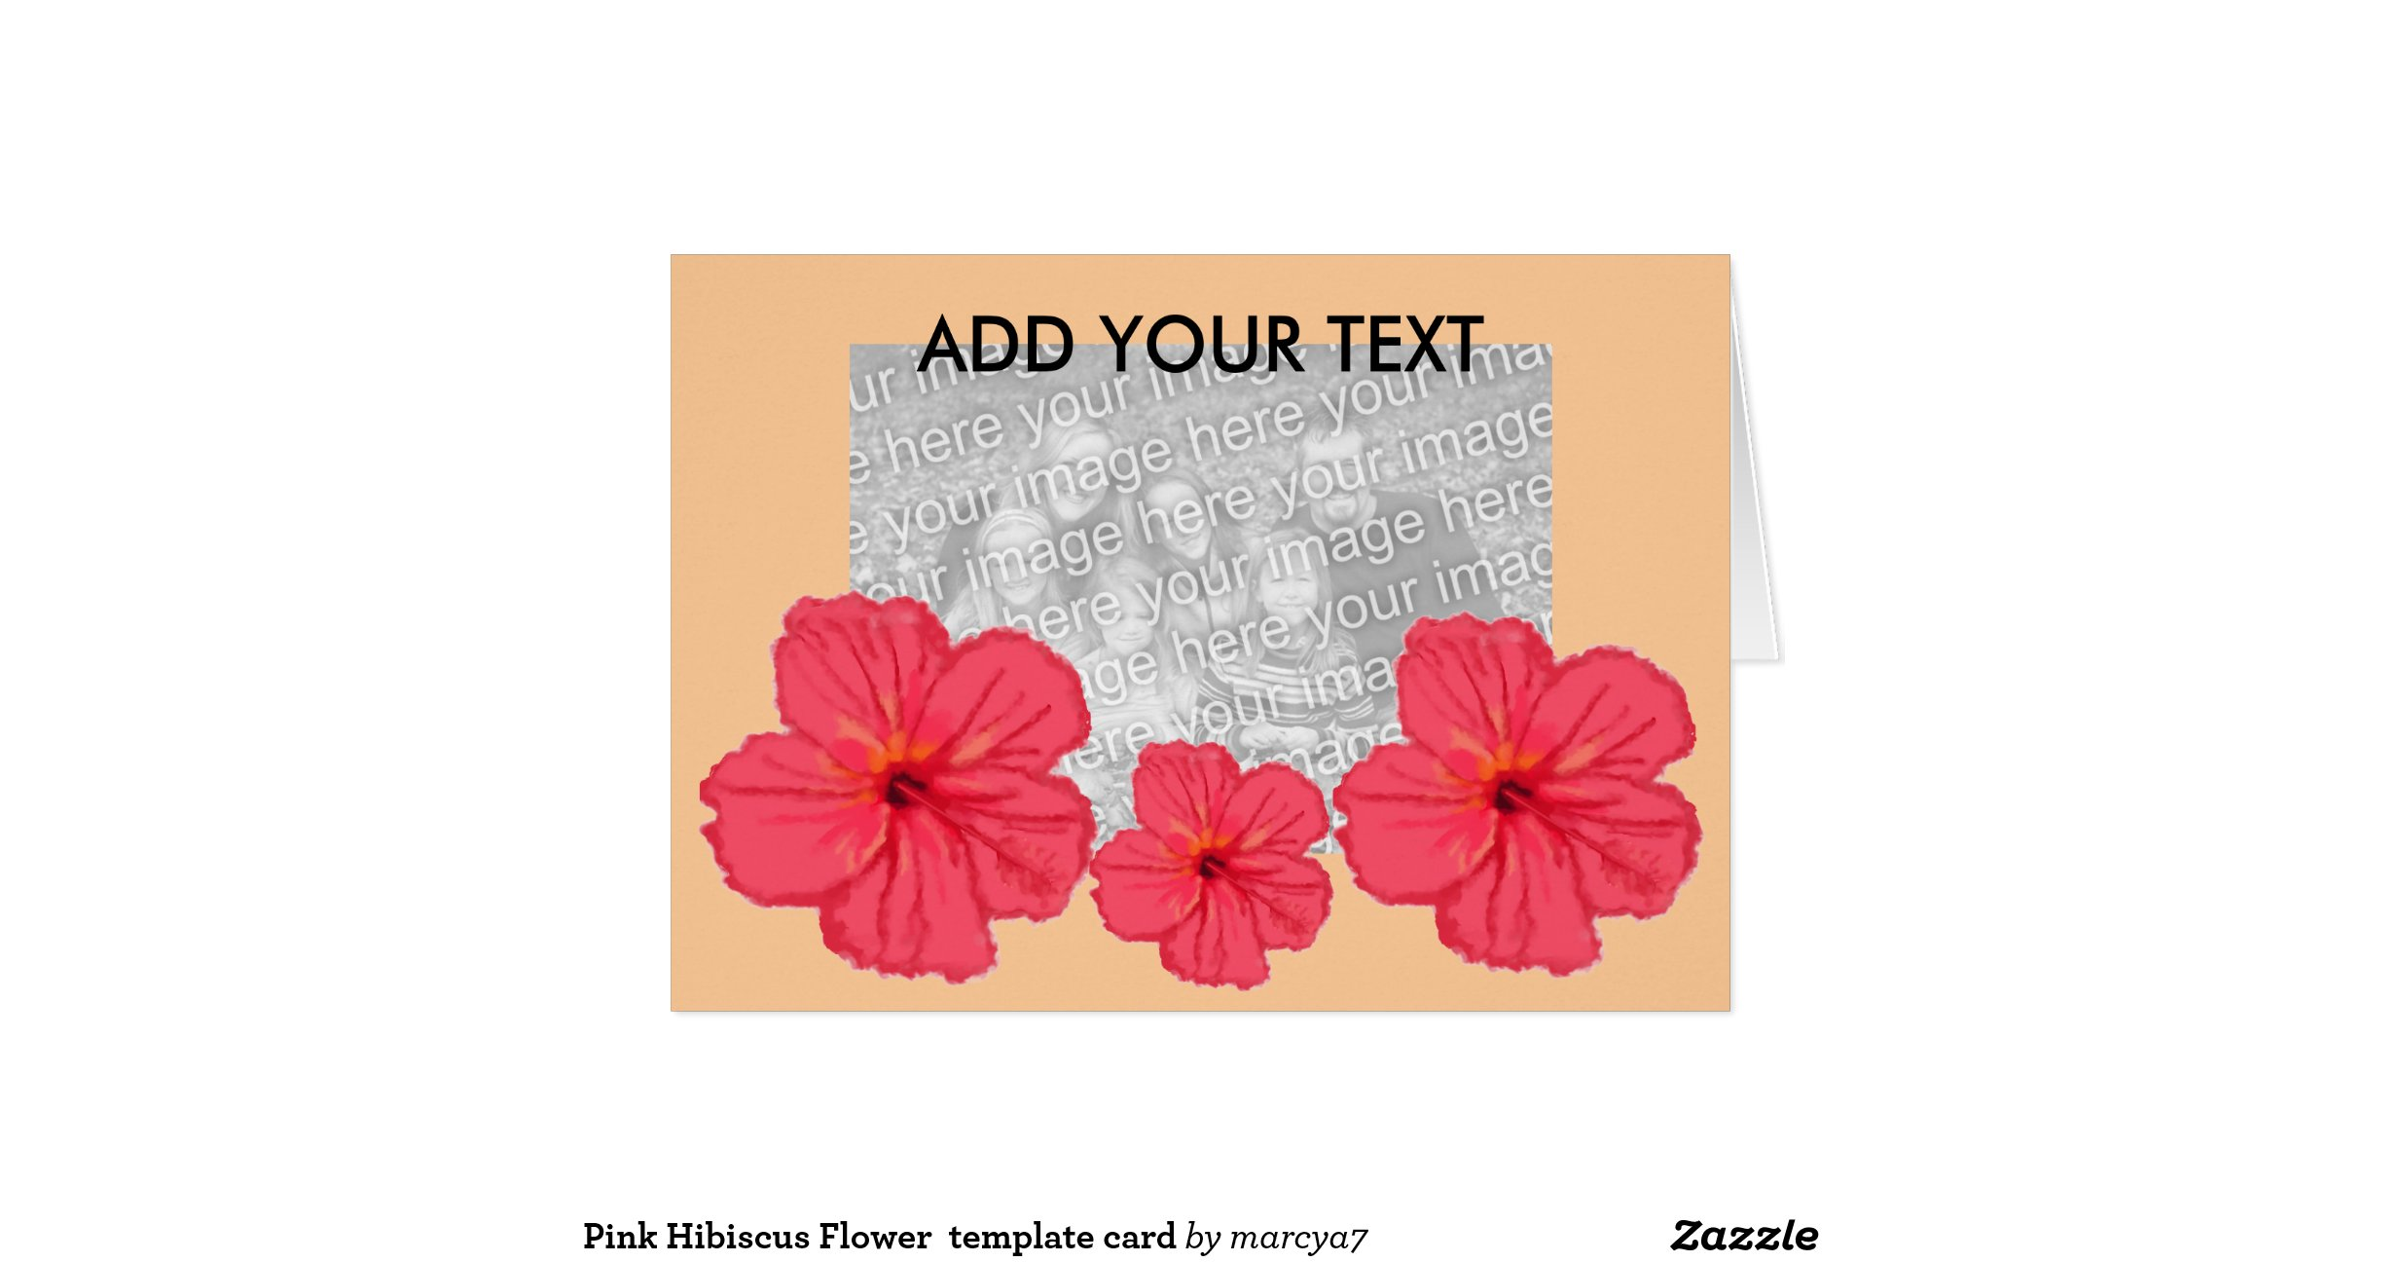 Hibiscus card template 28 images congratulations card design hibiscus card template by pink hibiscus flower template card zazzle izmirmasajfo